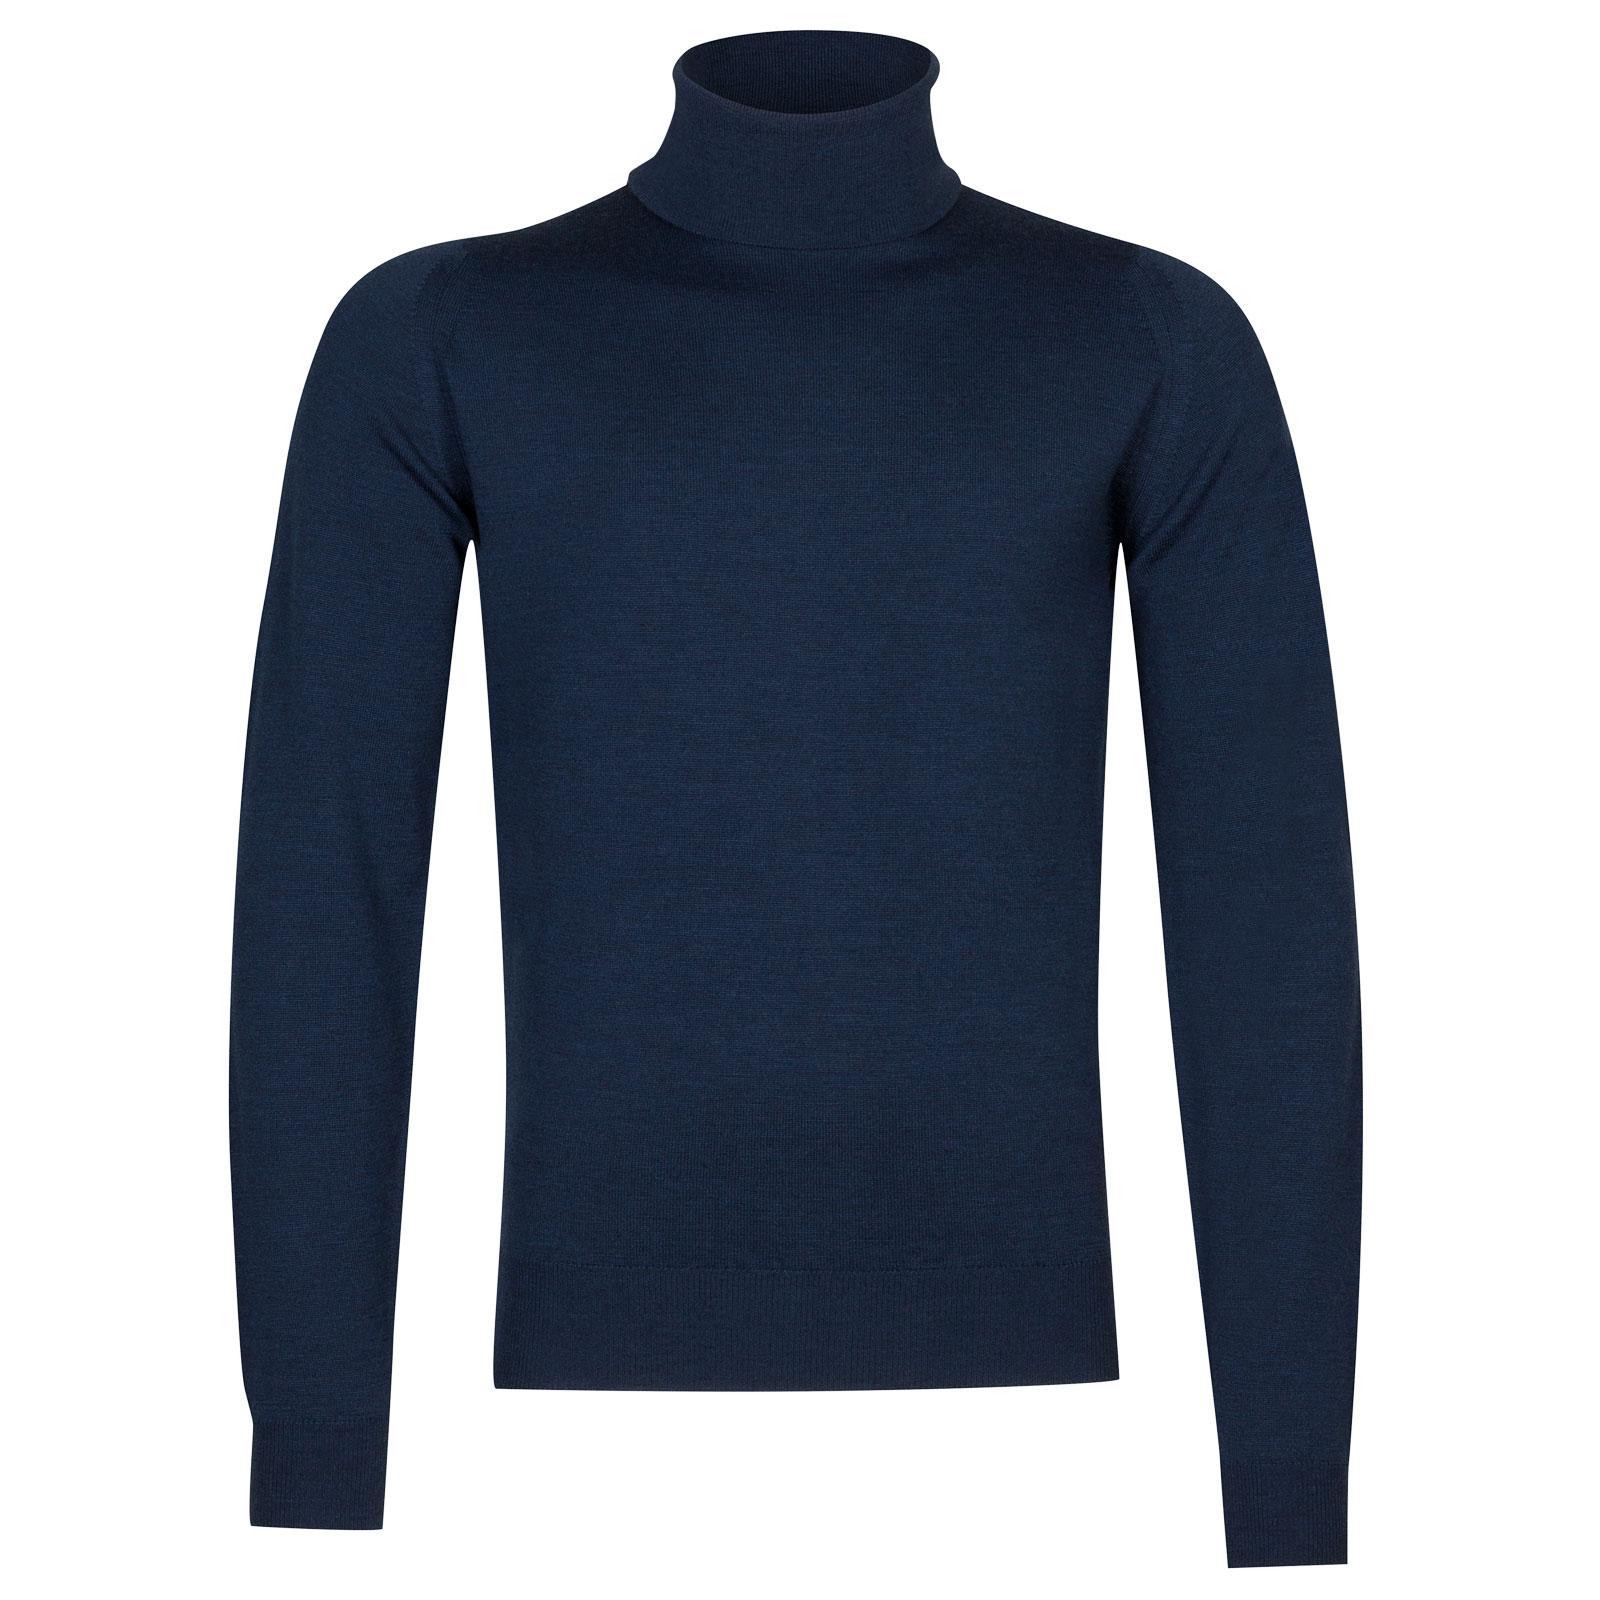 John Smedley connell Merino Wool Pullover in Indigo-S